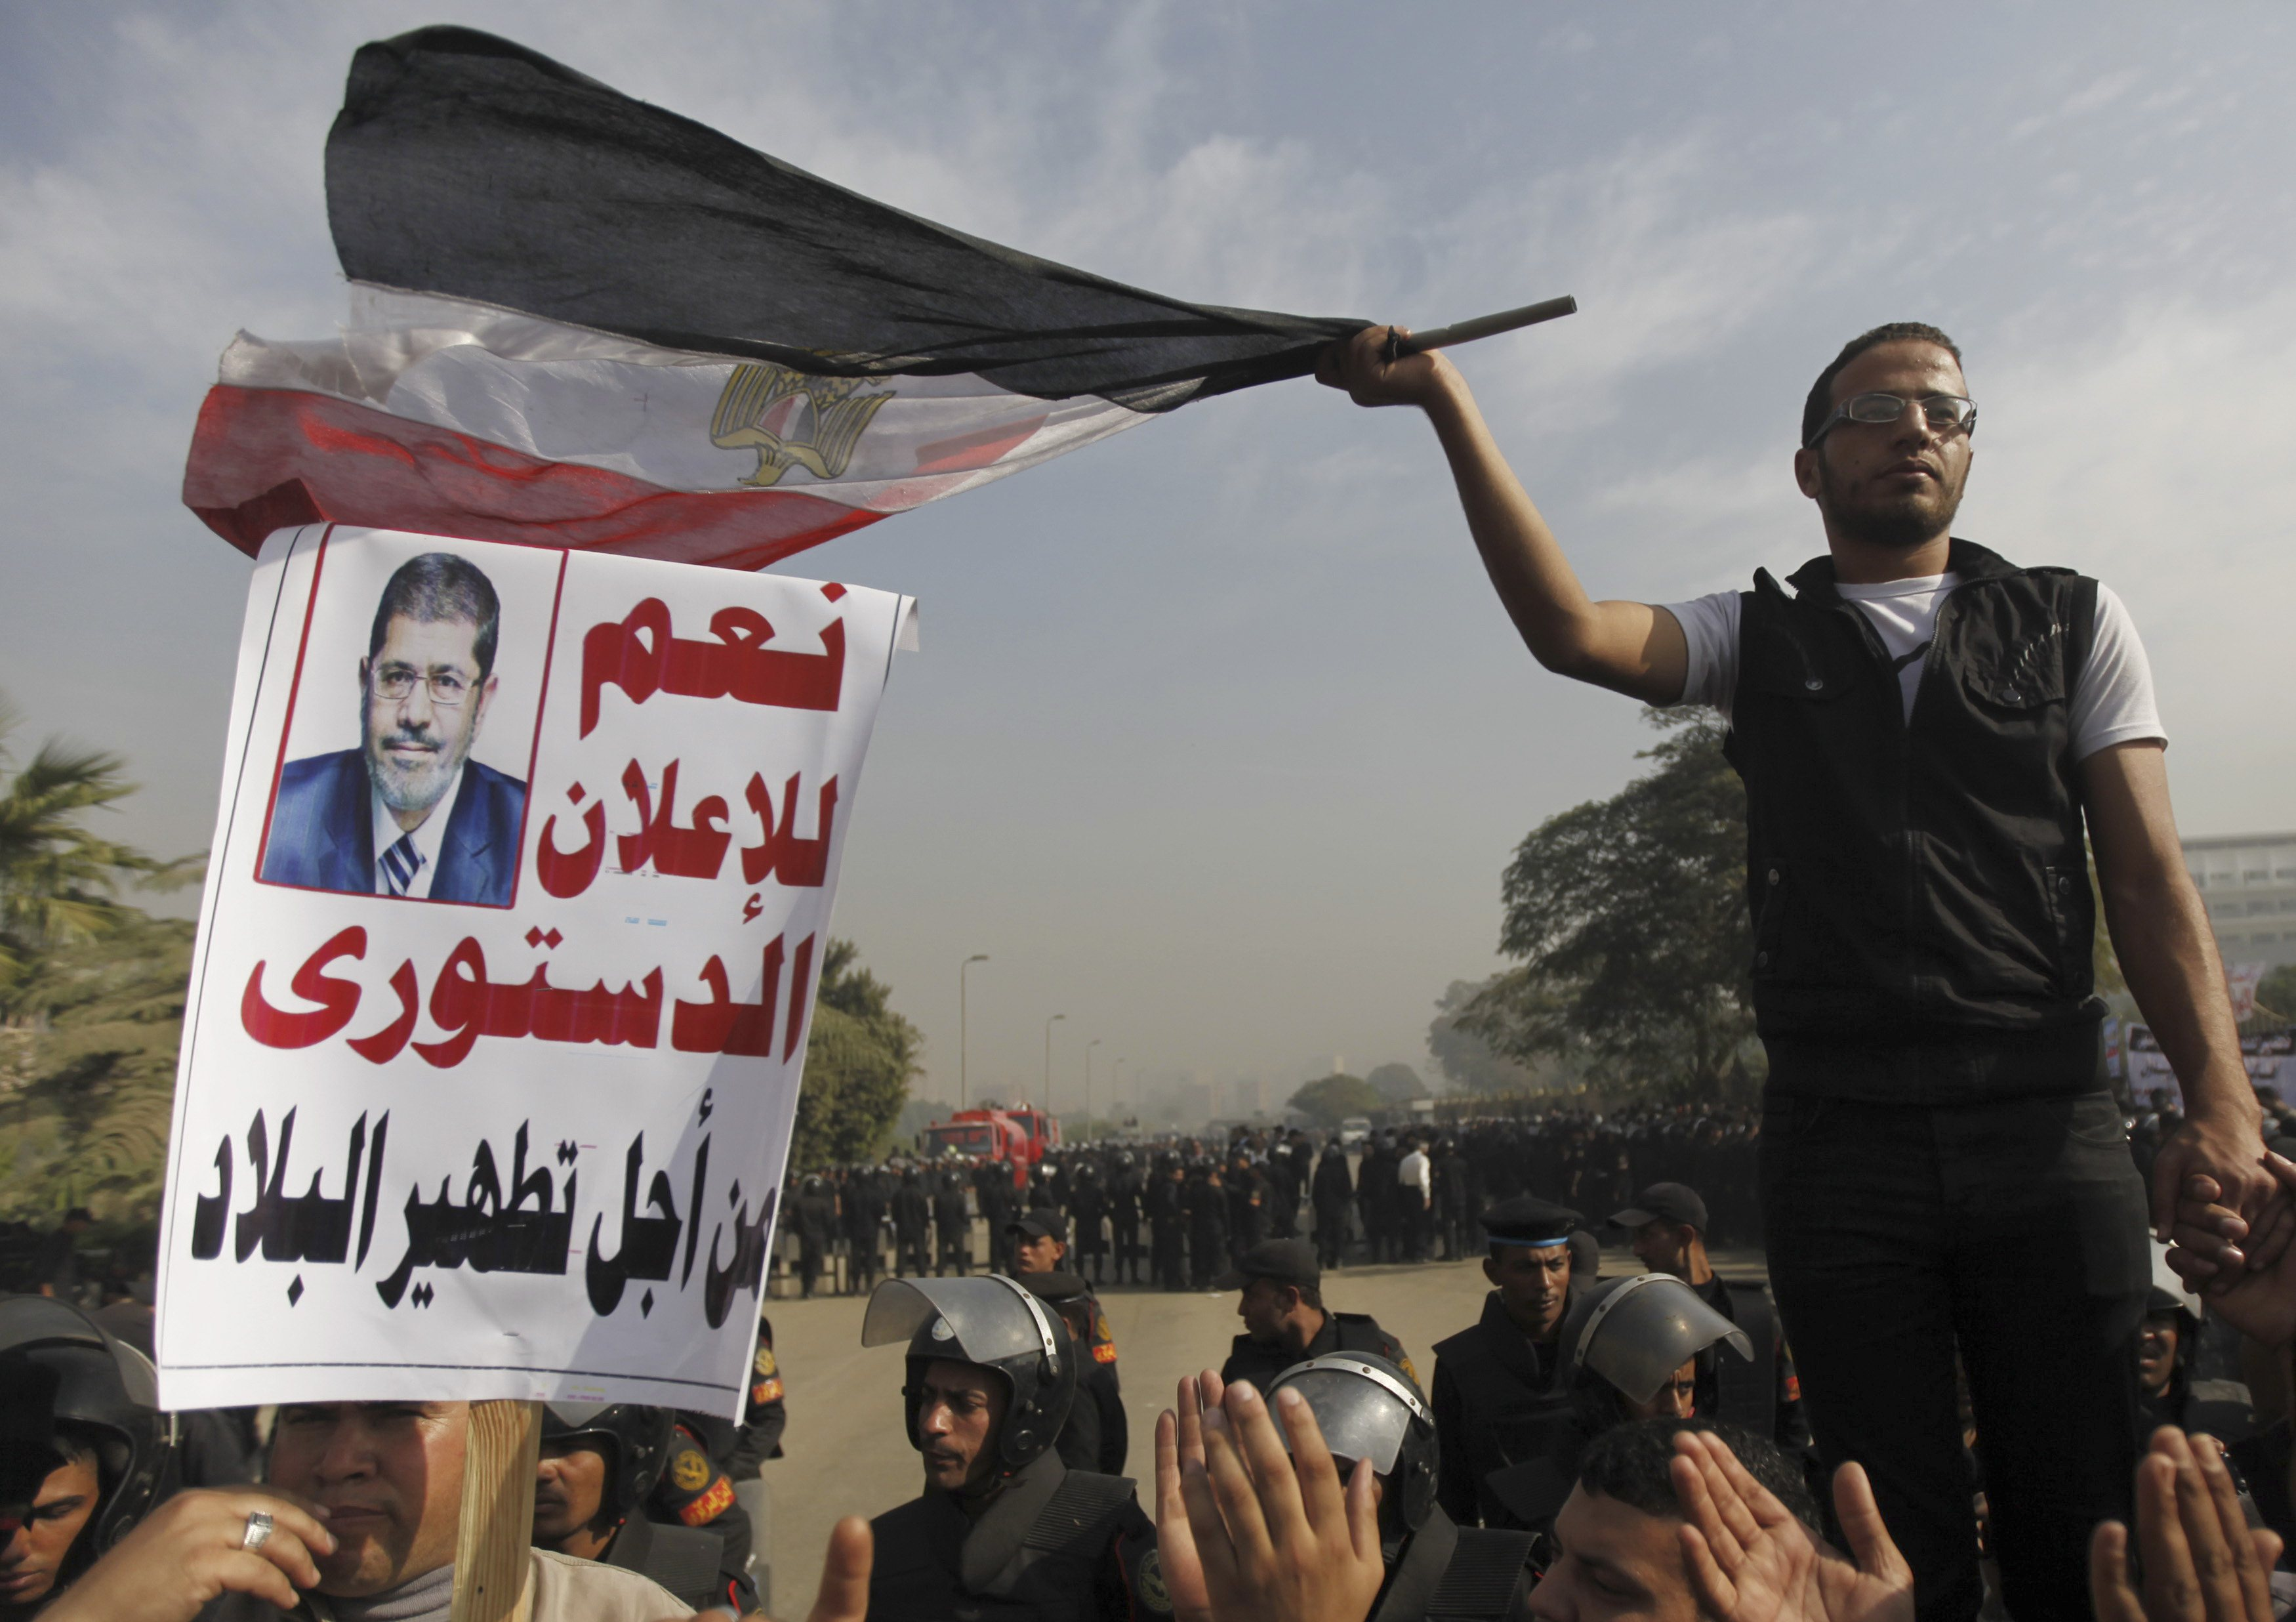 Egypt's highest court suspends work after Islamist protest